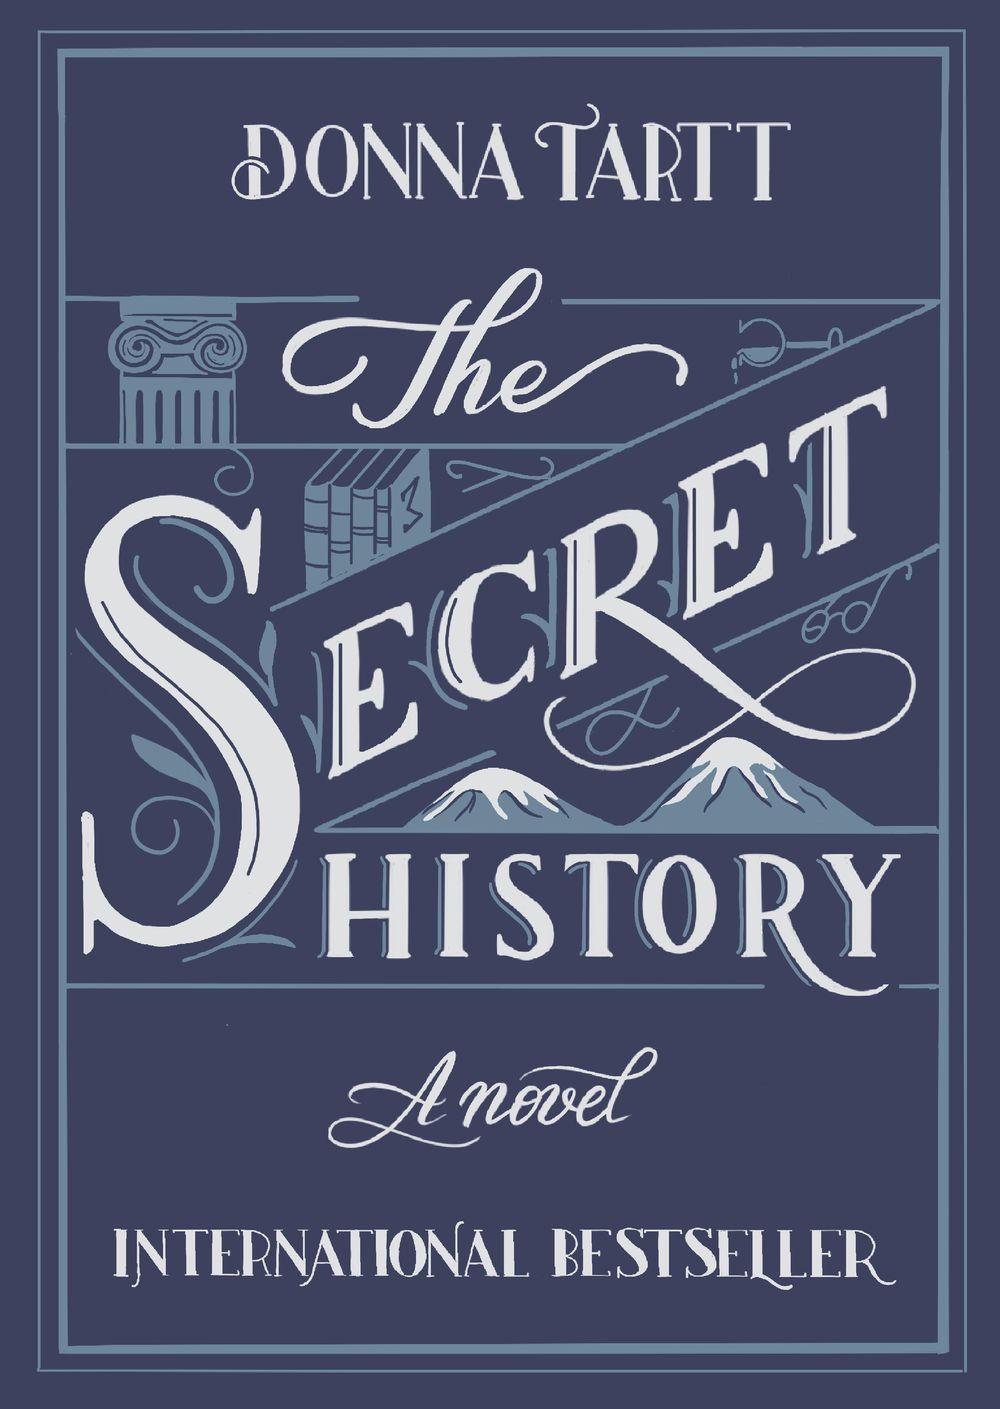 Donna Tartt - The secret history - image 8 - student project